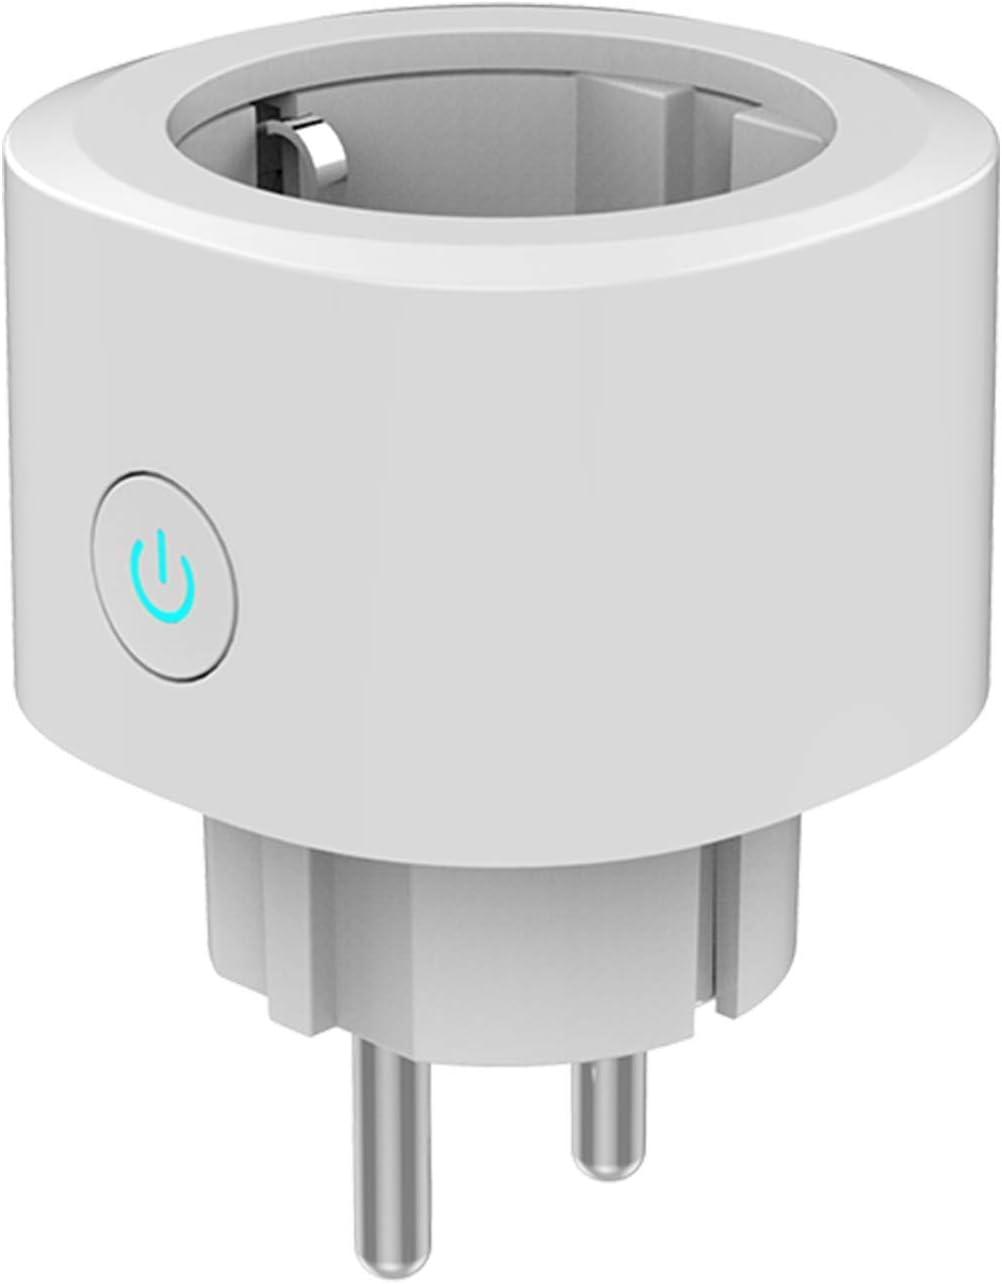 Woox Control Remoto Universal Inteligente